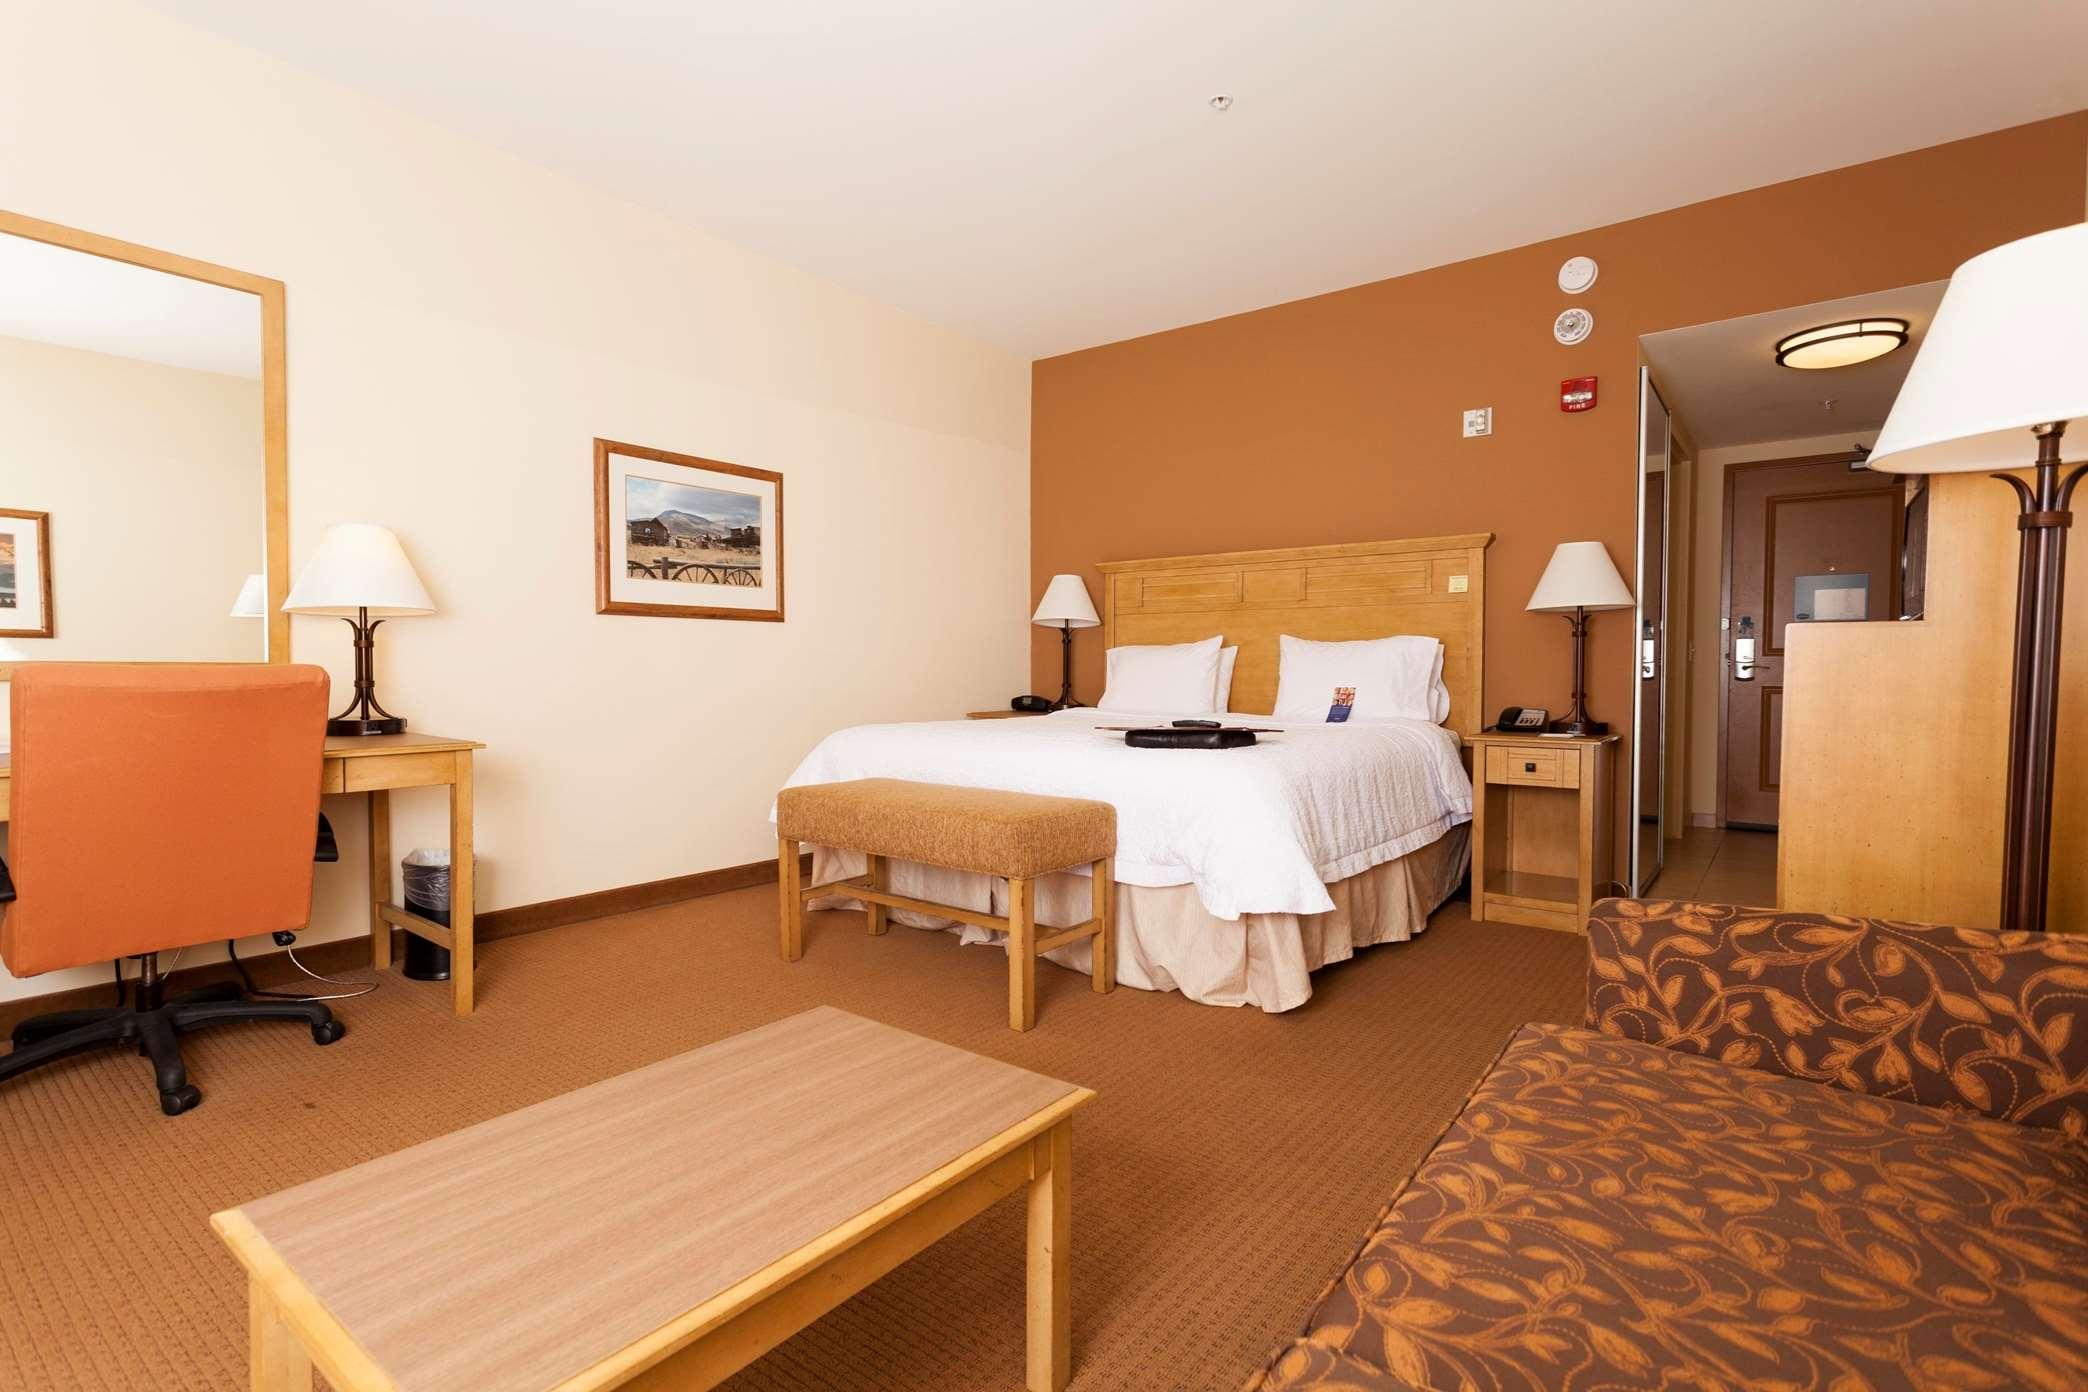 Hampton Inn & Suites Riverton image 5